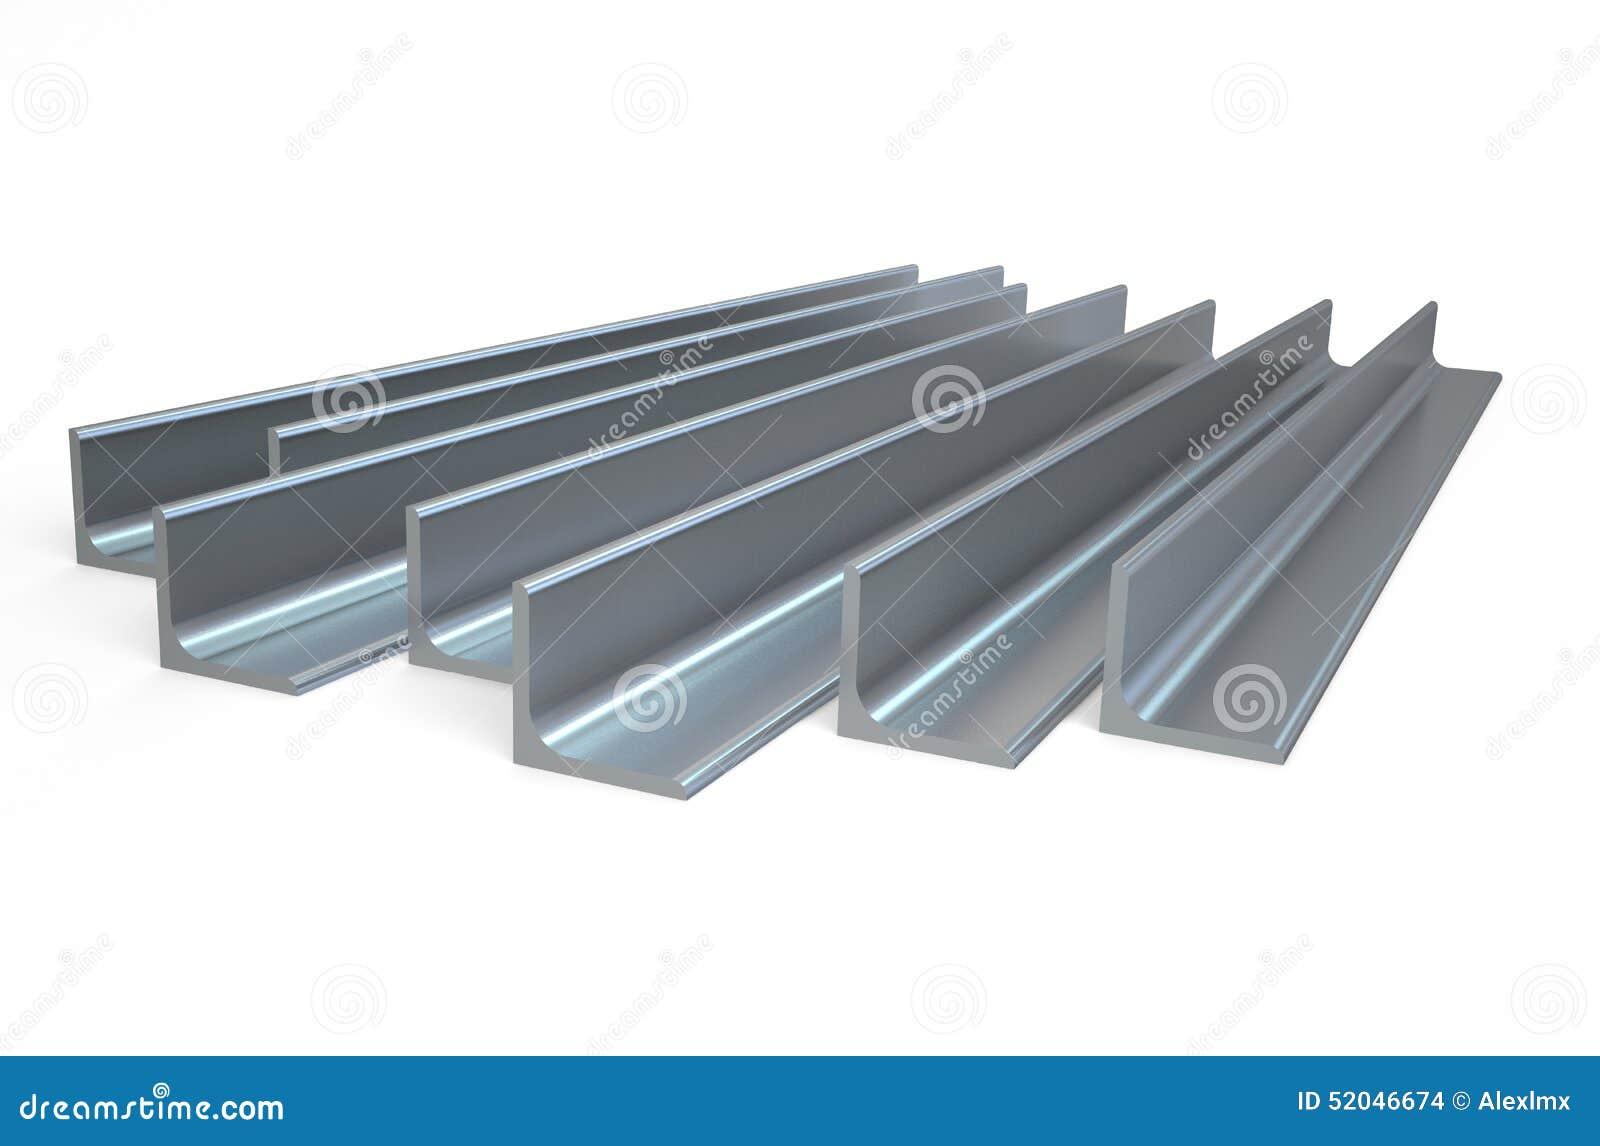 Rolled Metal L Bar Angle Stock Illustration Illustration